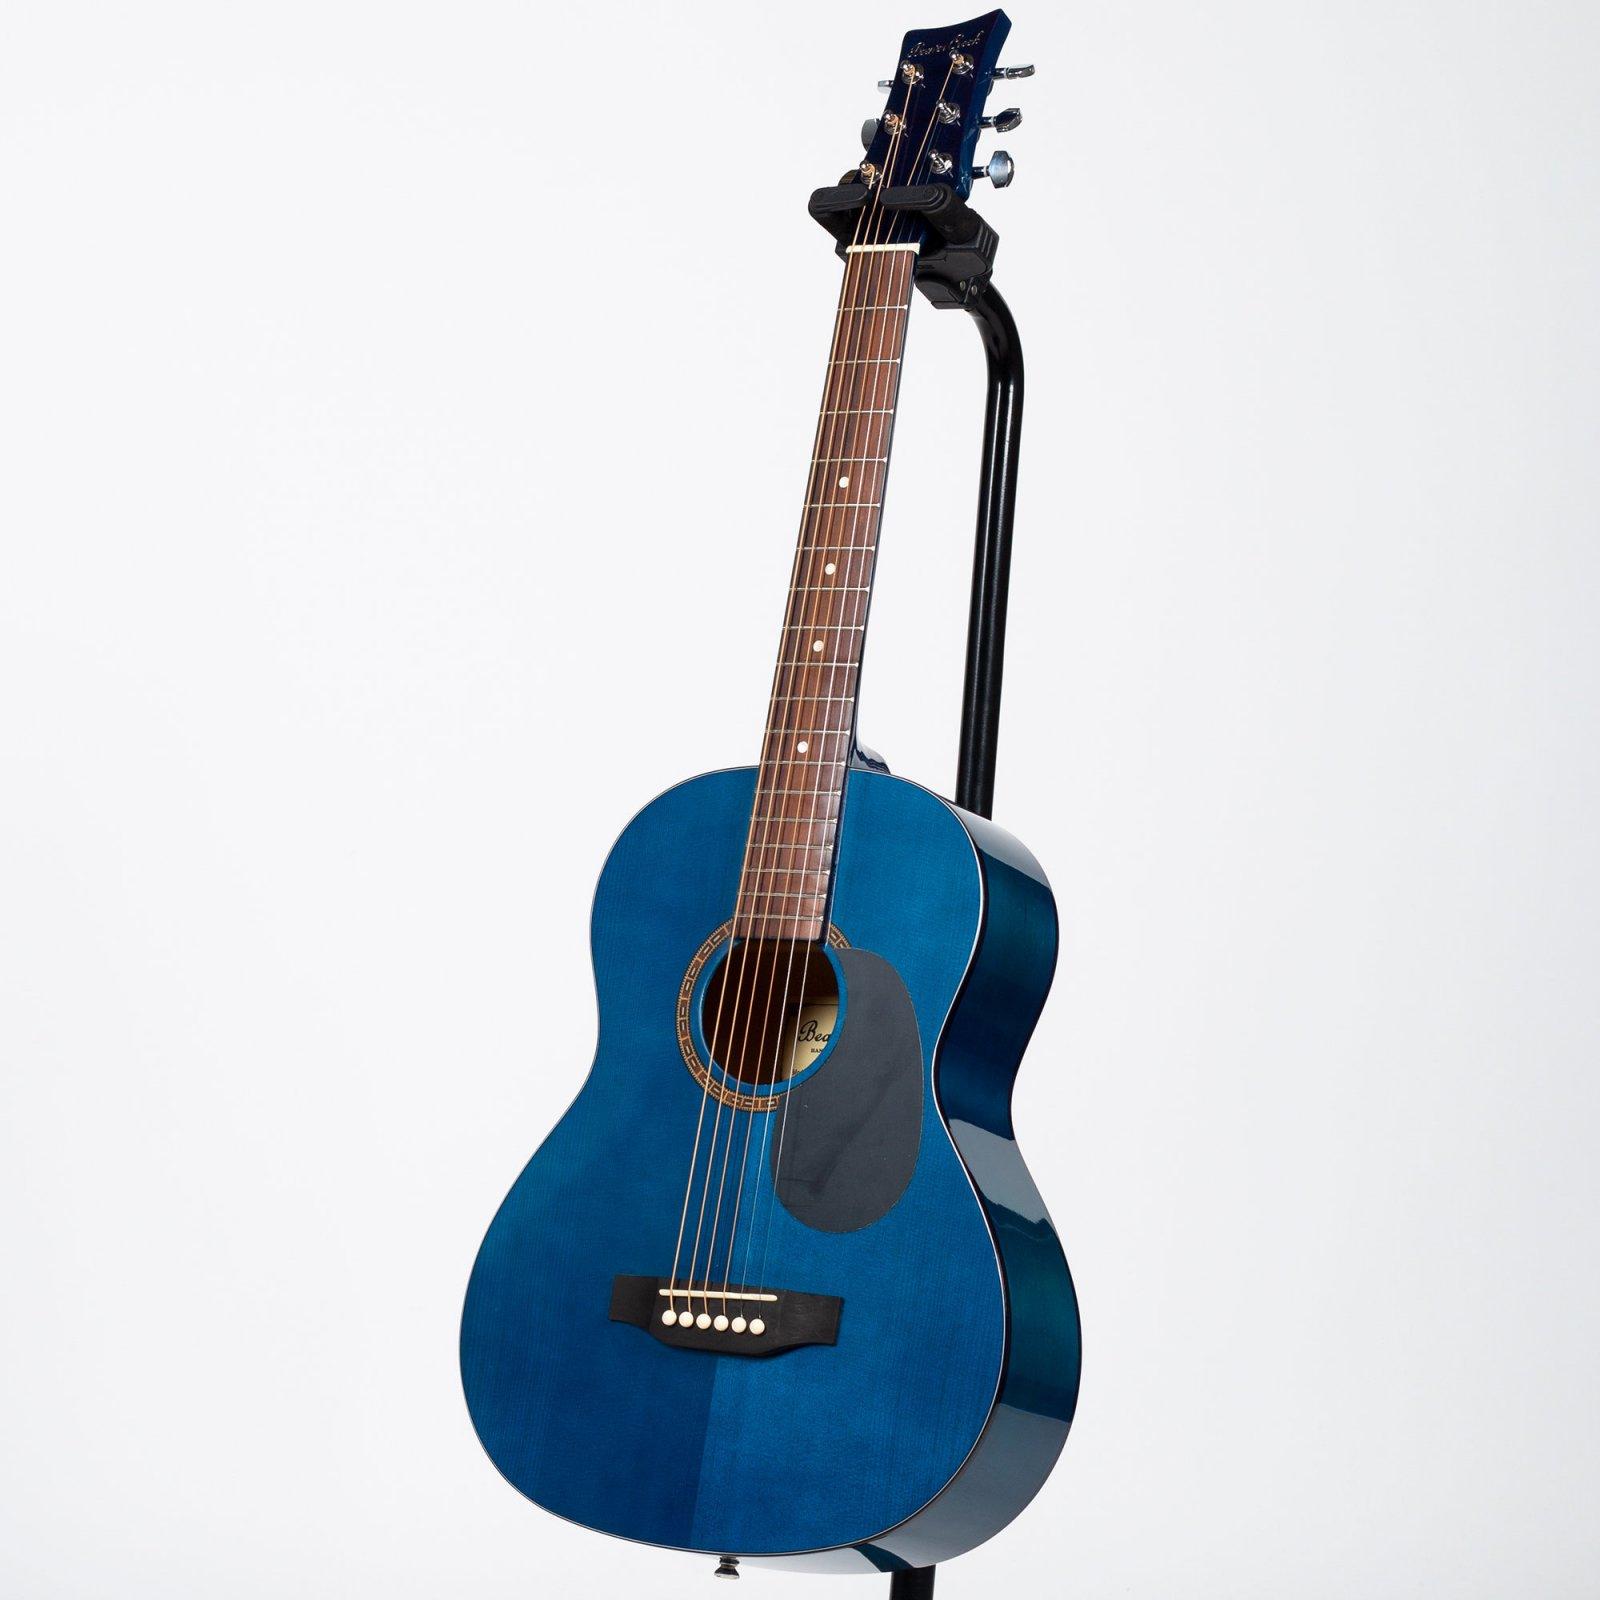 BeaverCreek - BCTD601TB 3/4 Size Acoustic Guitar - Transparent Blue